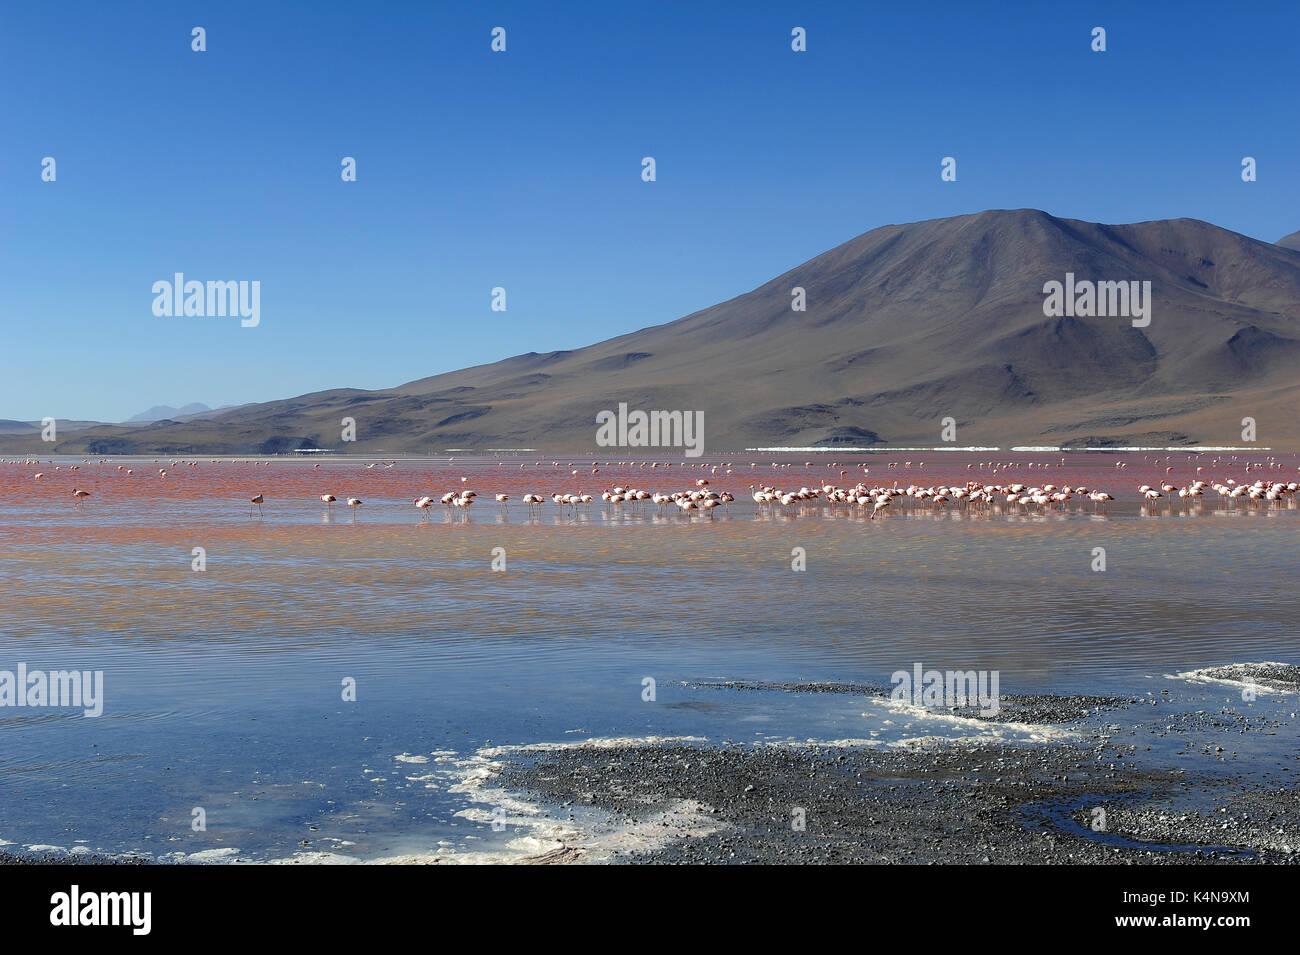 La Laguna Colorada (laguna colorada), Reserva de Fauna Andina Eduardo Avaroa, sur de Bolivia. Imagen De Stock